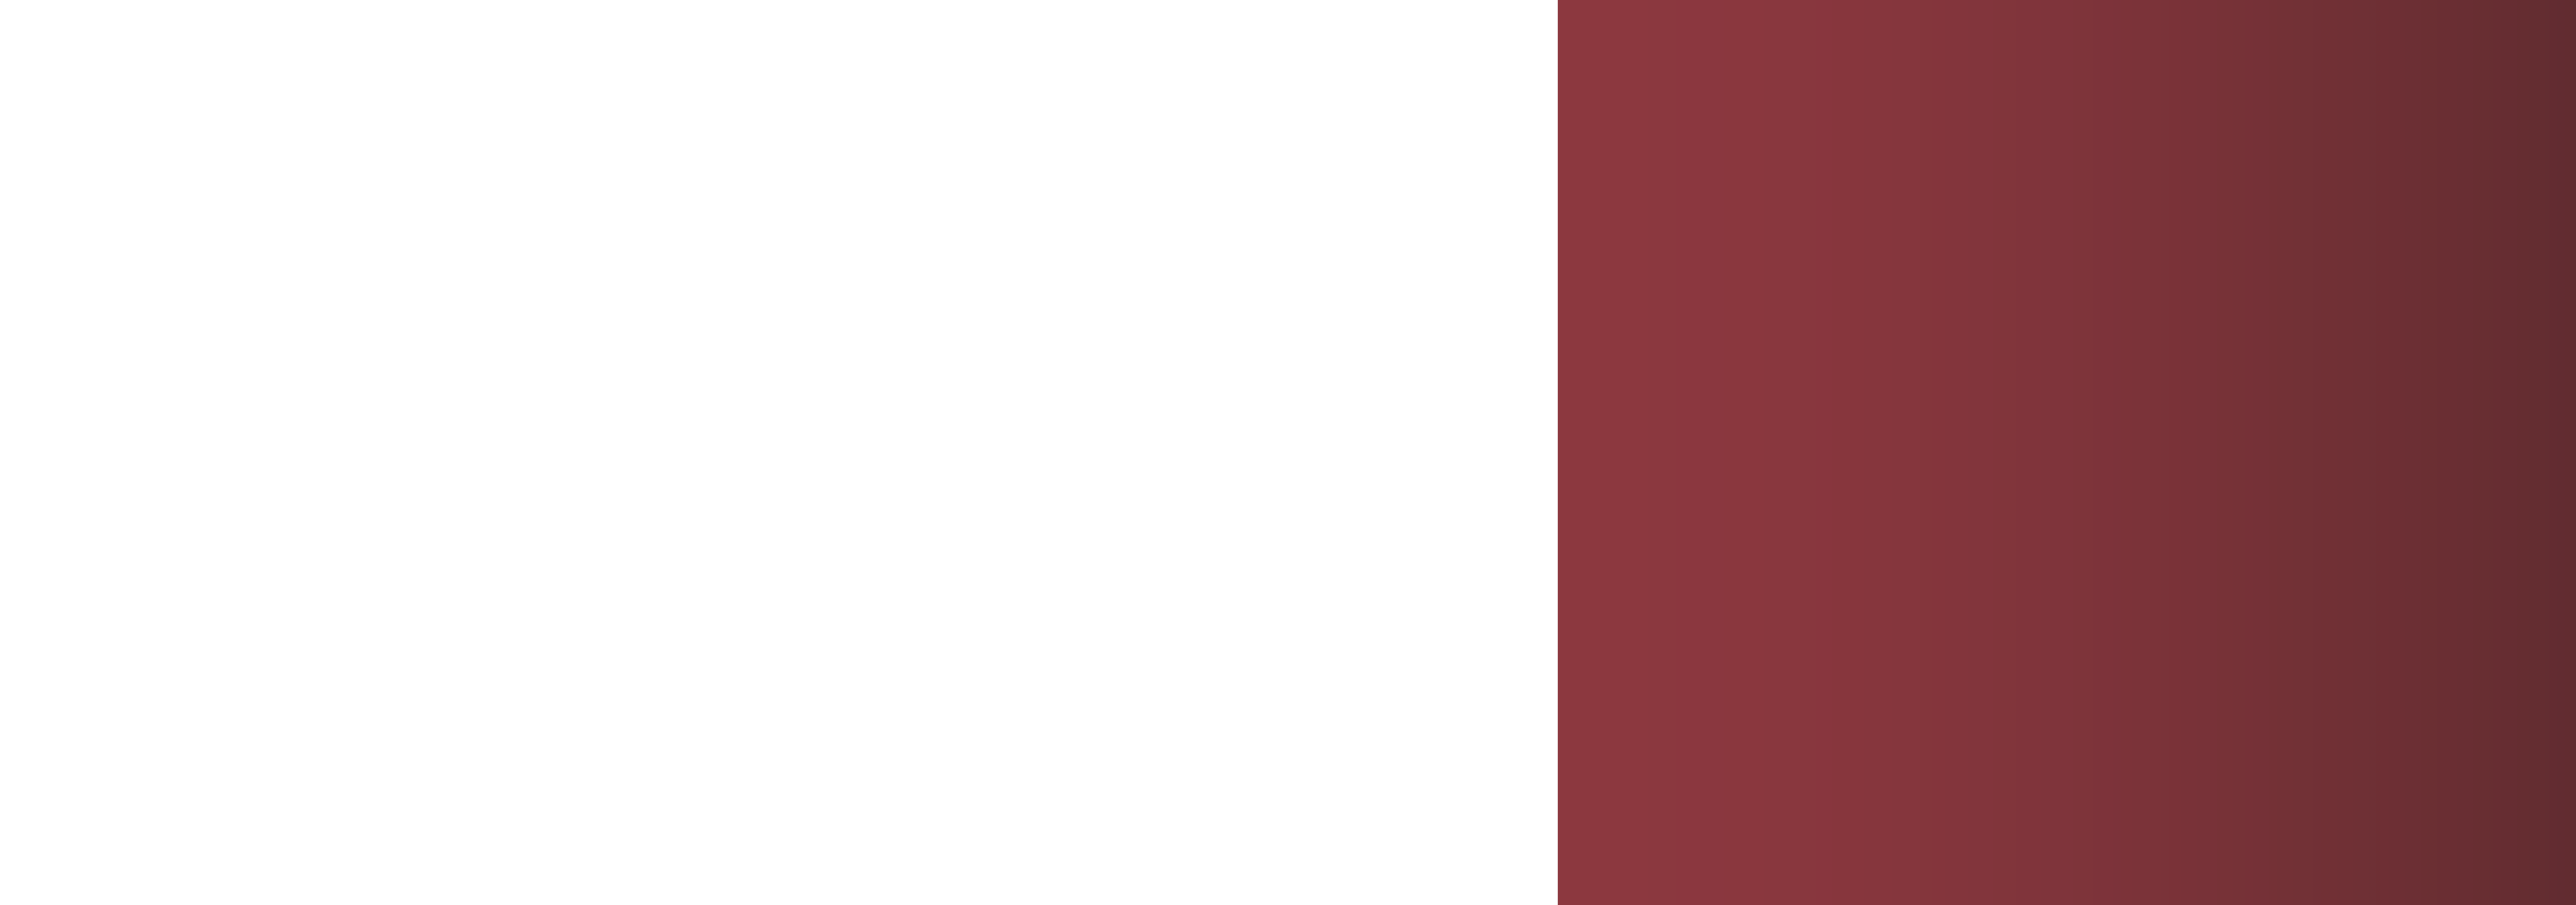 Banner-Burgundy